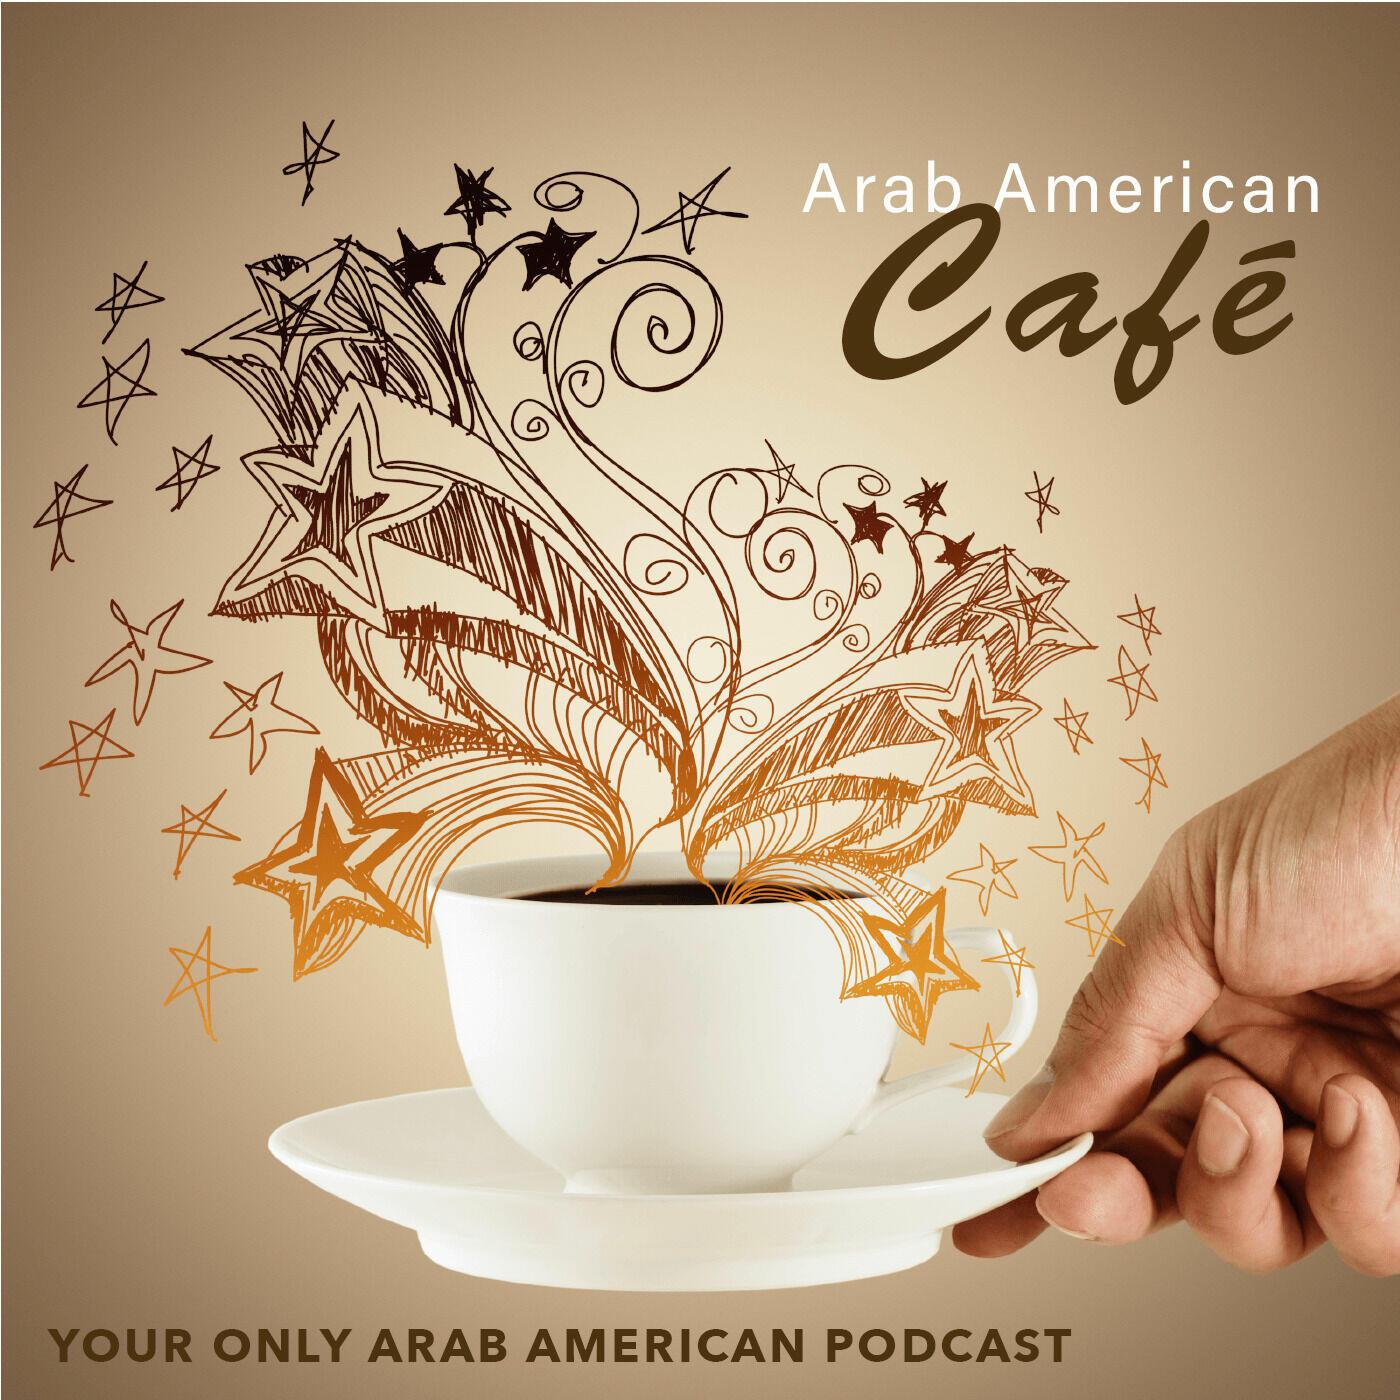 Arab American Café